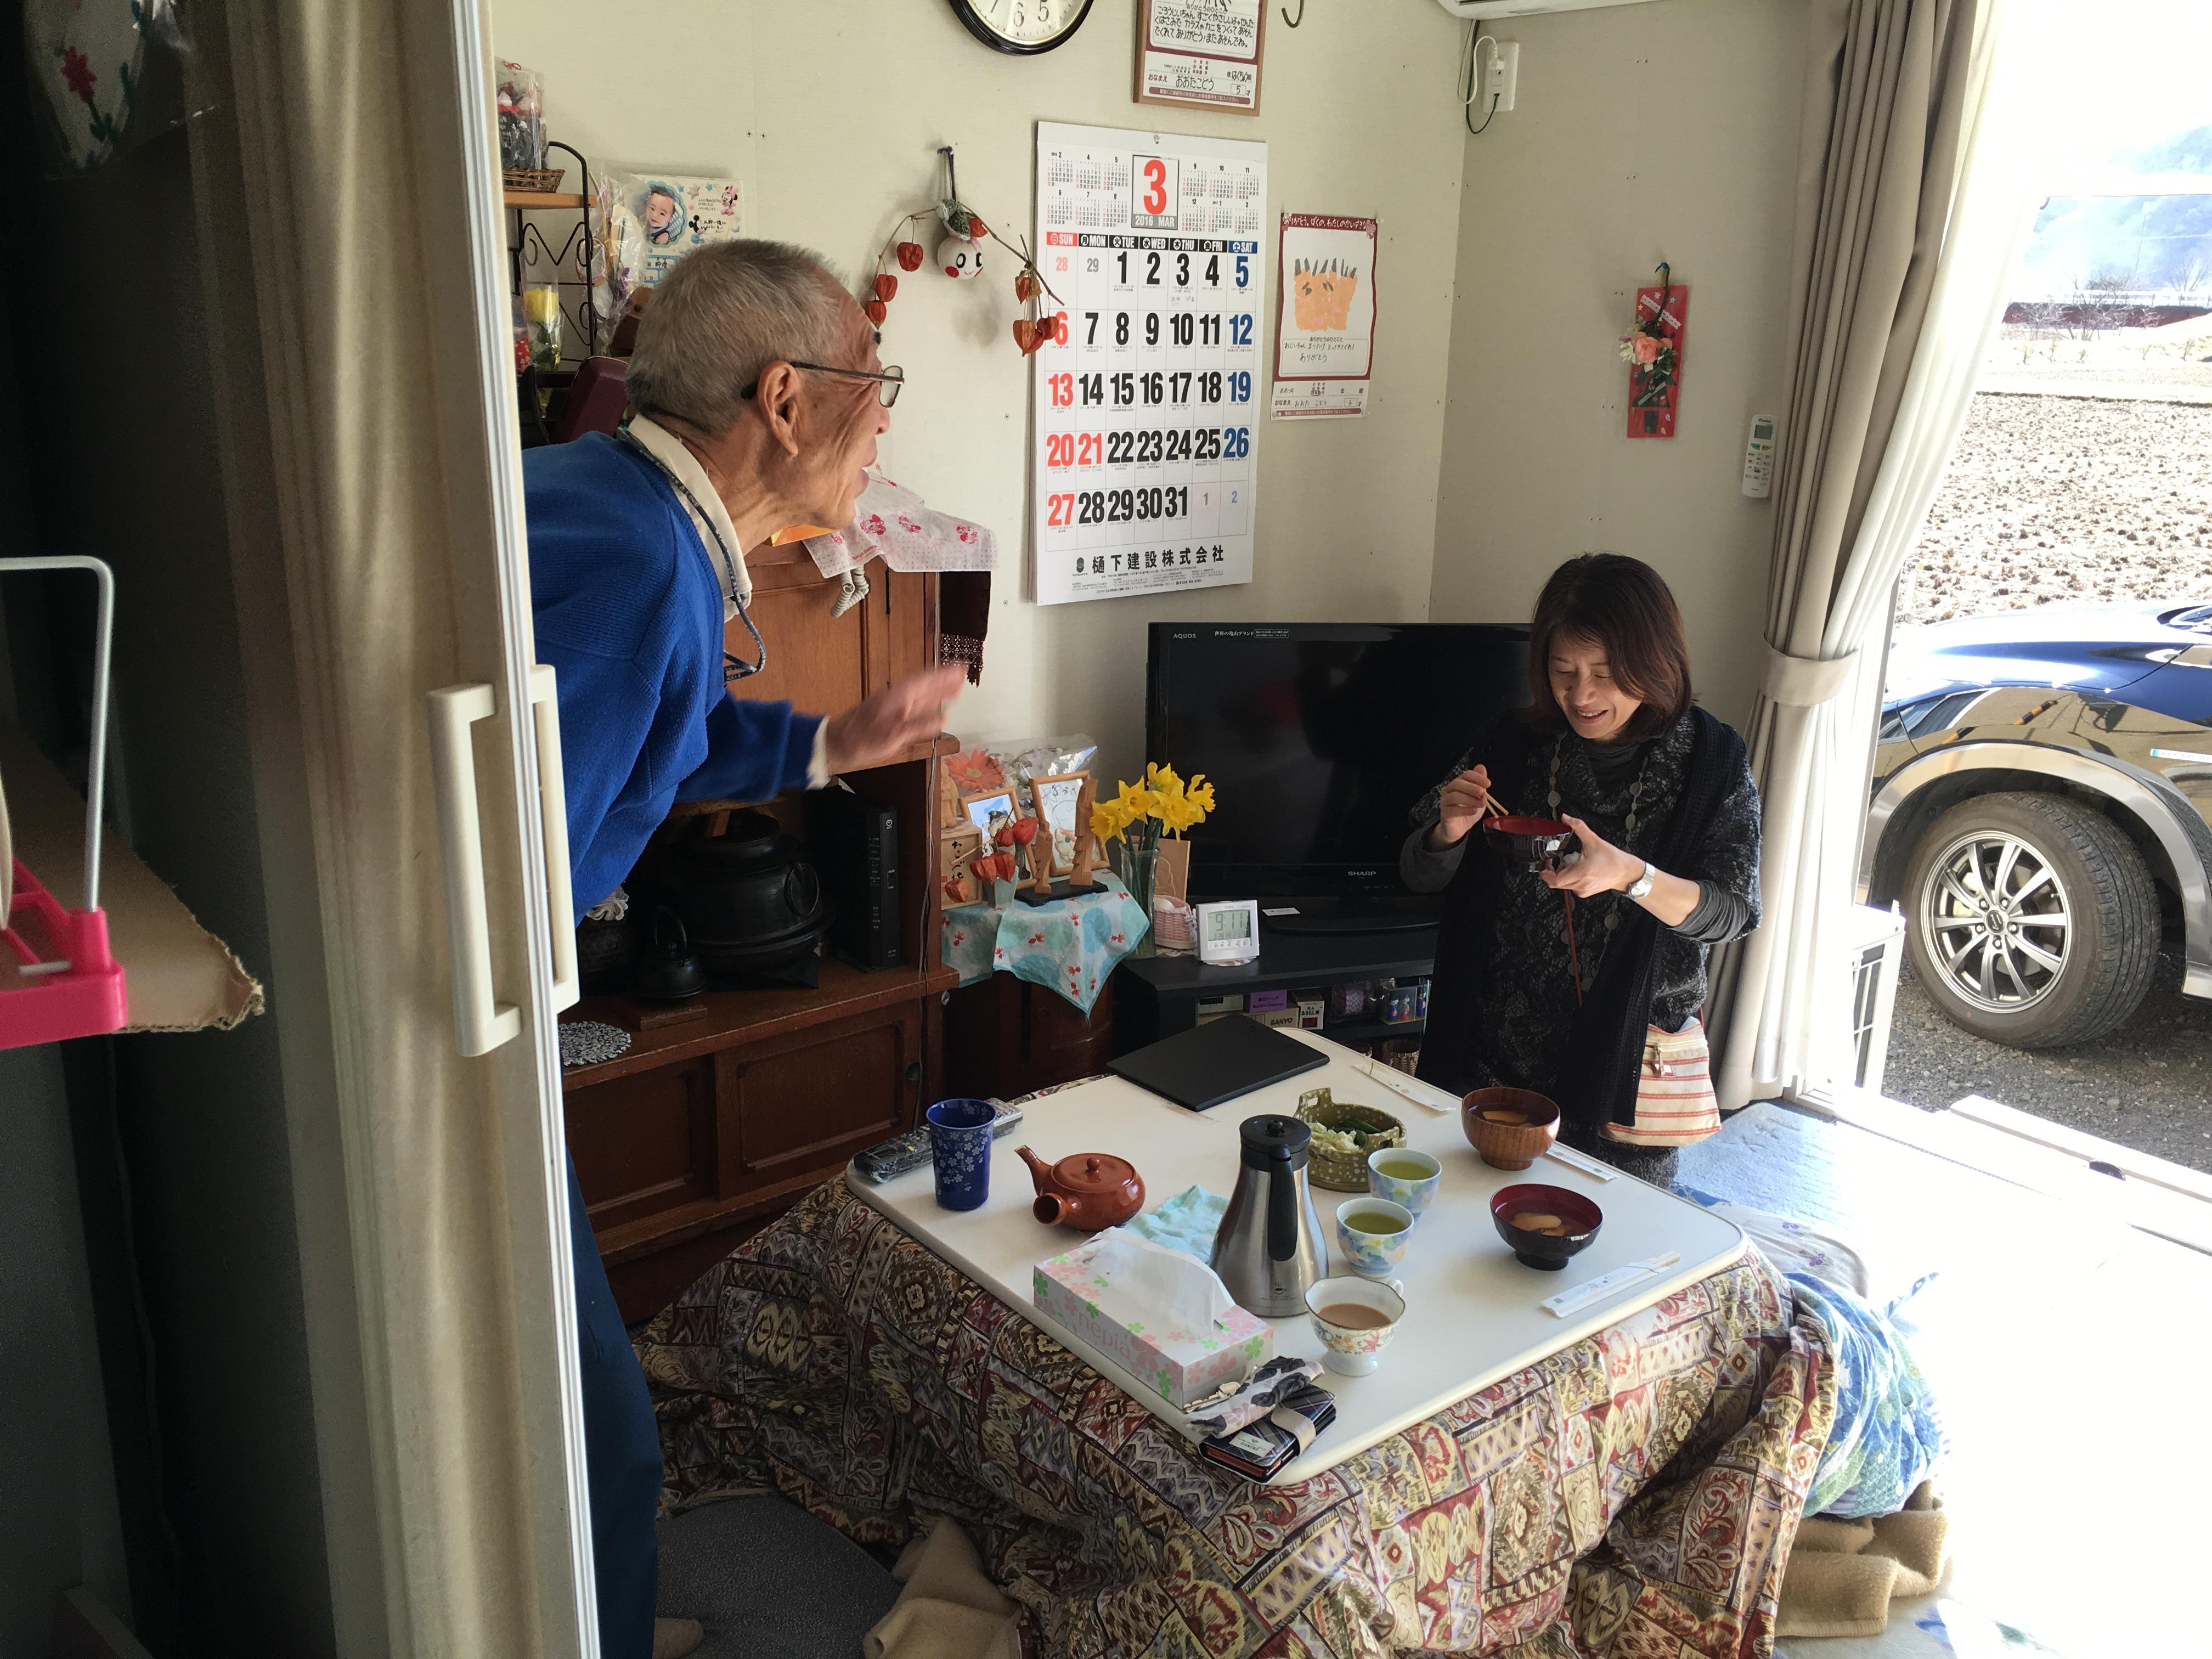 otsuchi temporary housing kasetu living space 2016.JPG